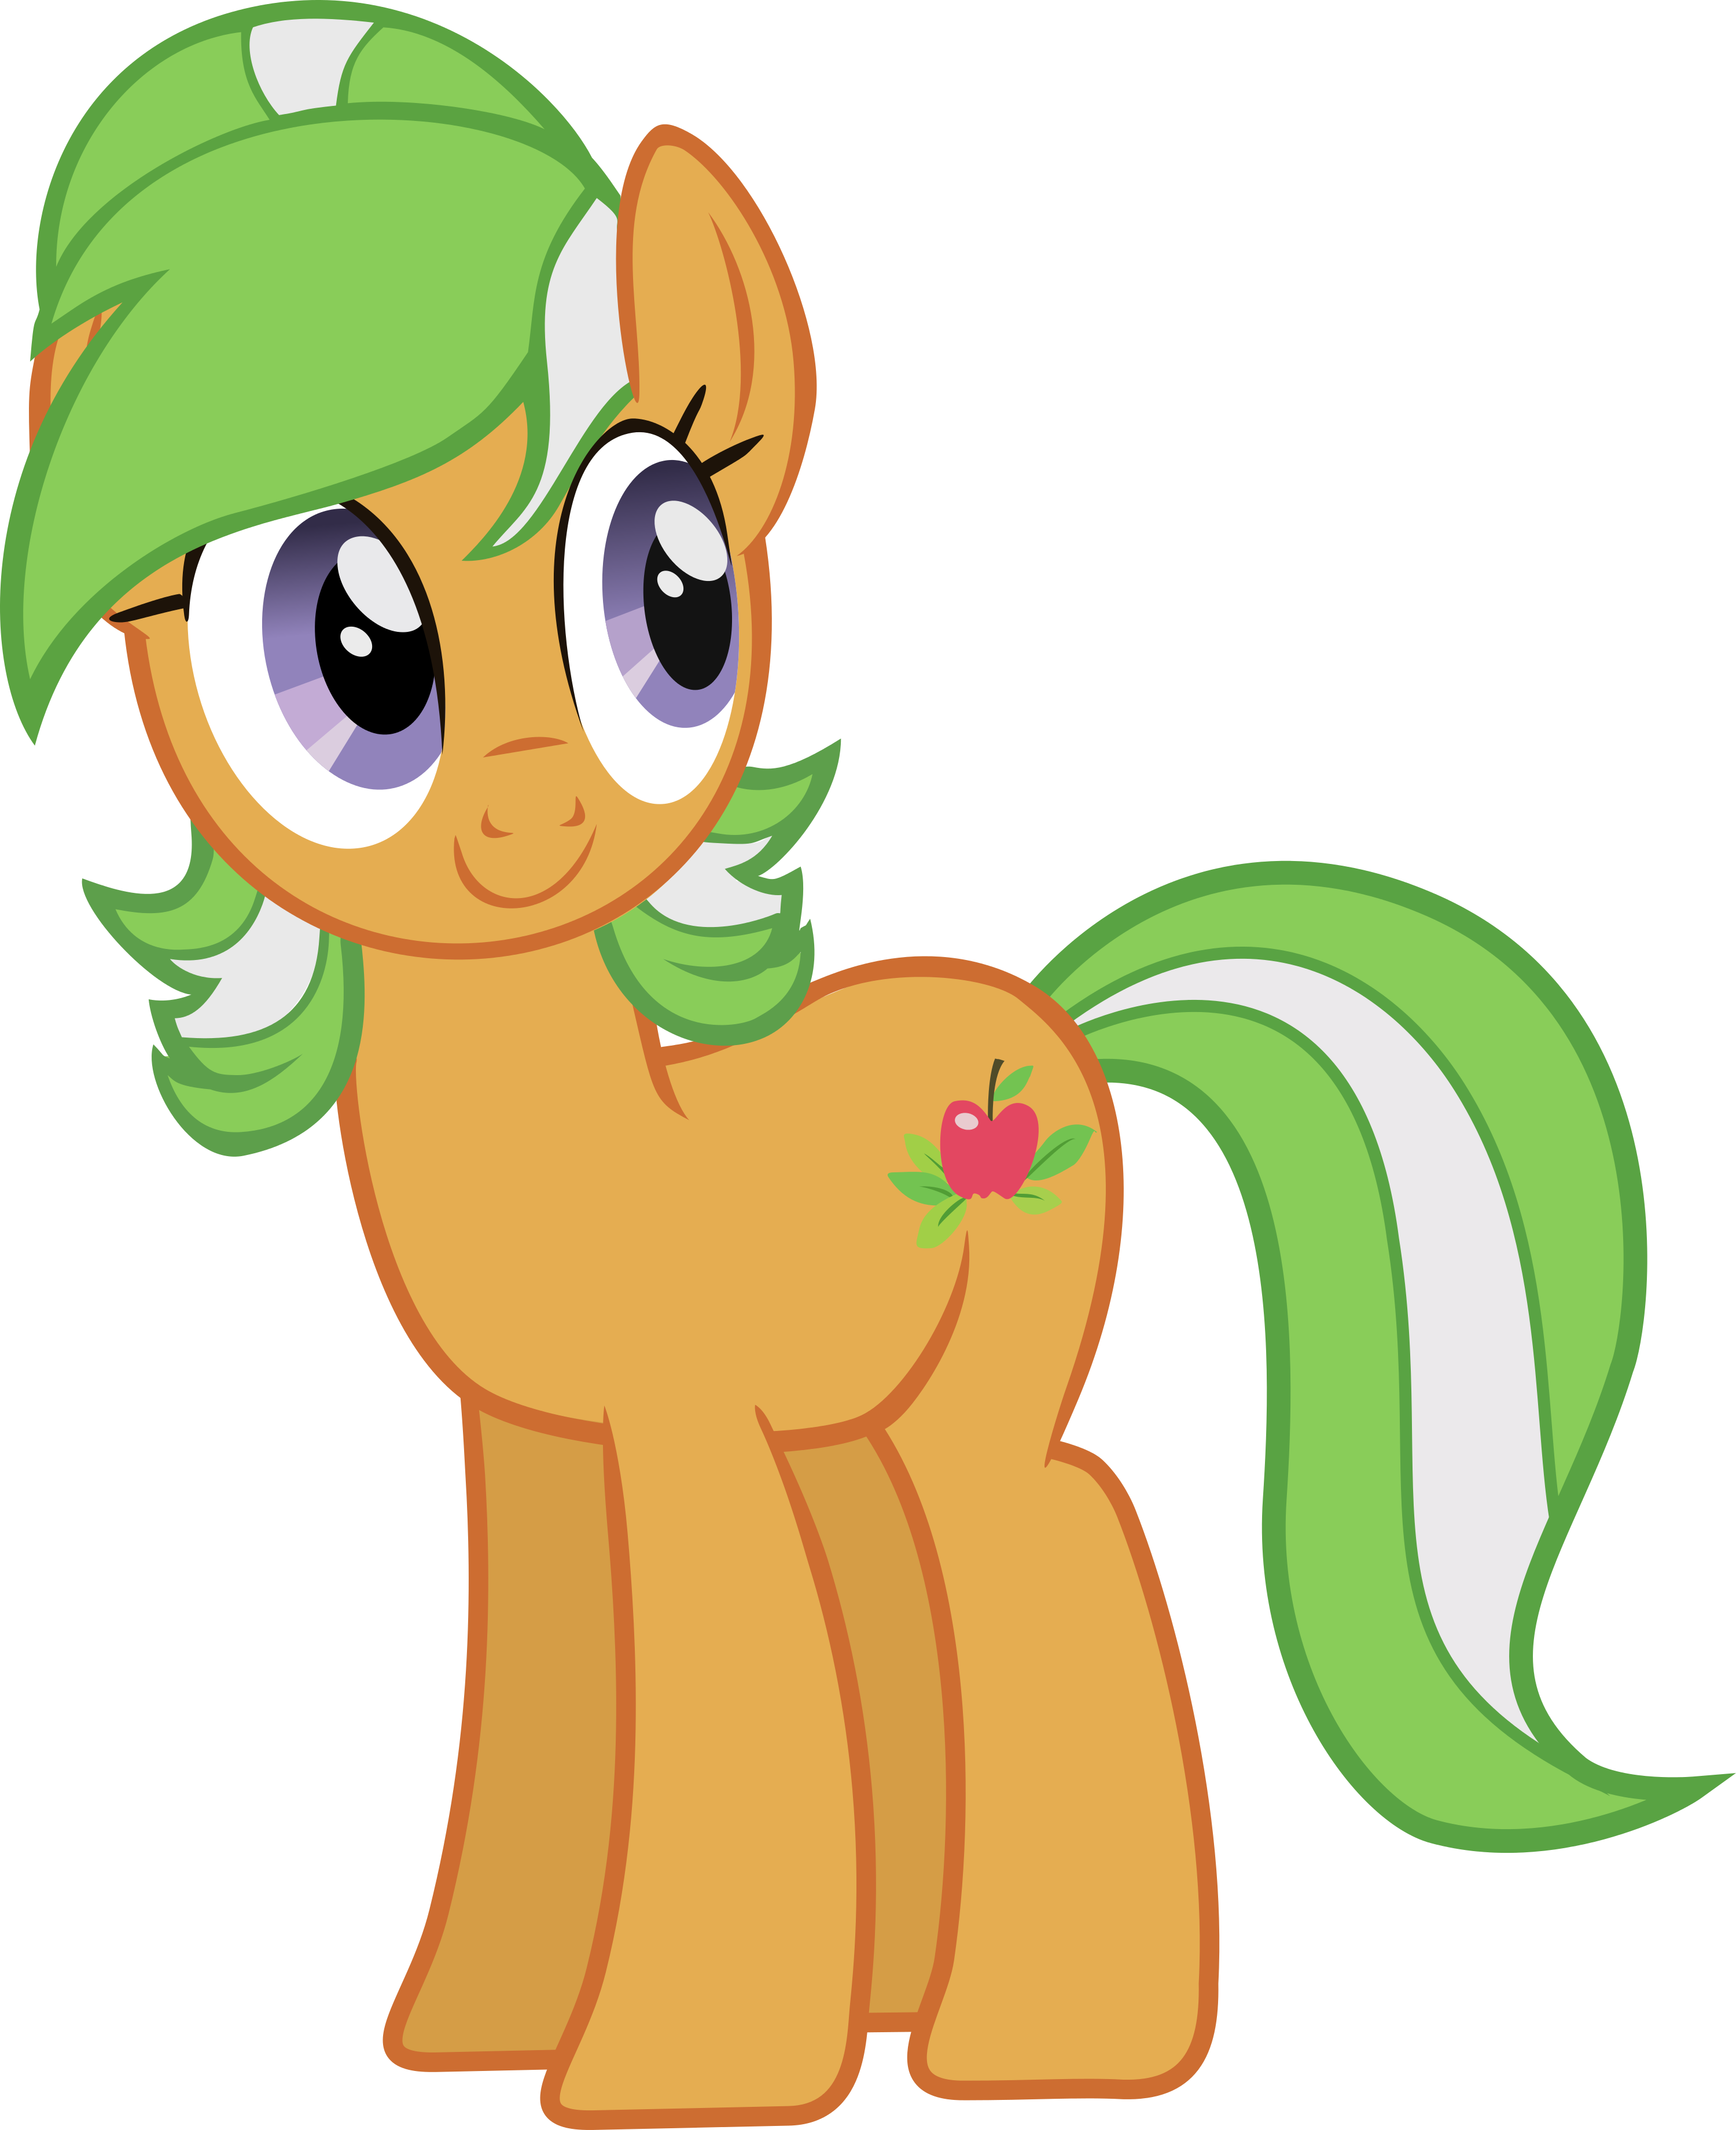 Výsledek obrázku pro mlp apple leaves